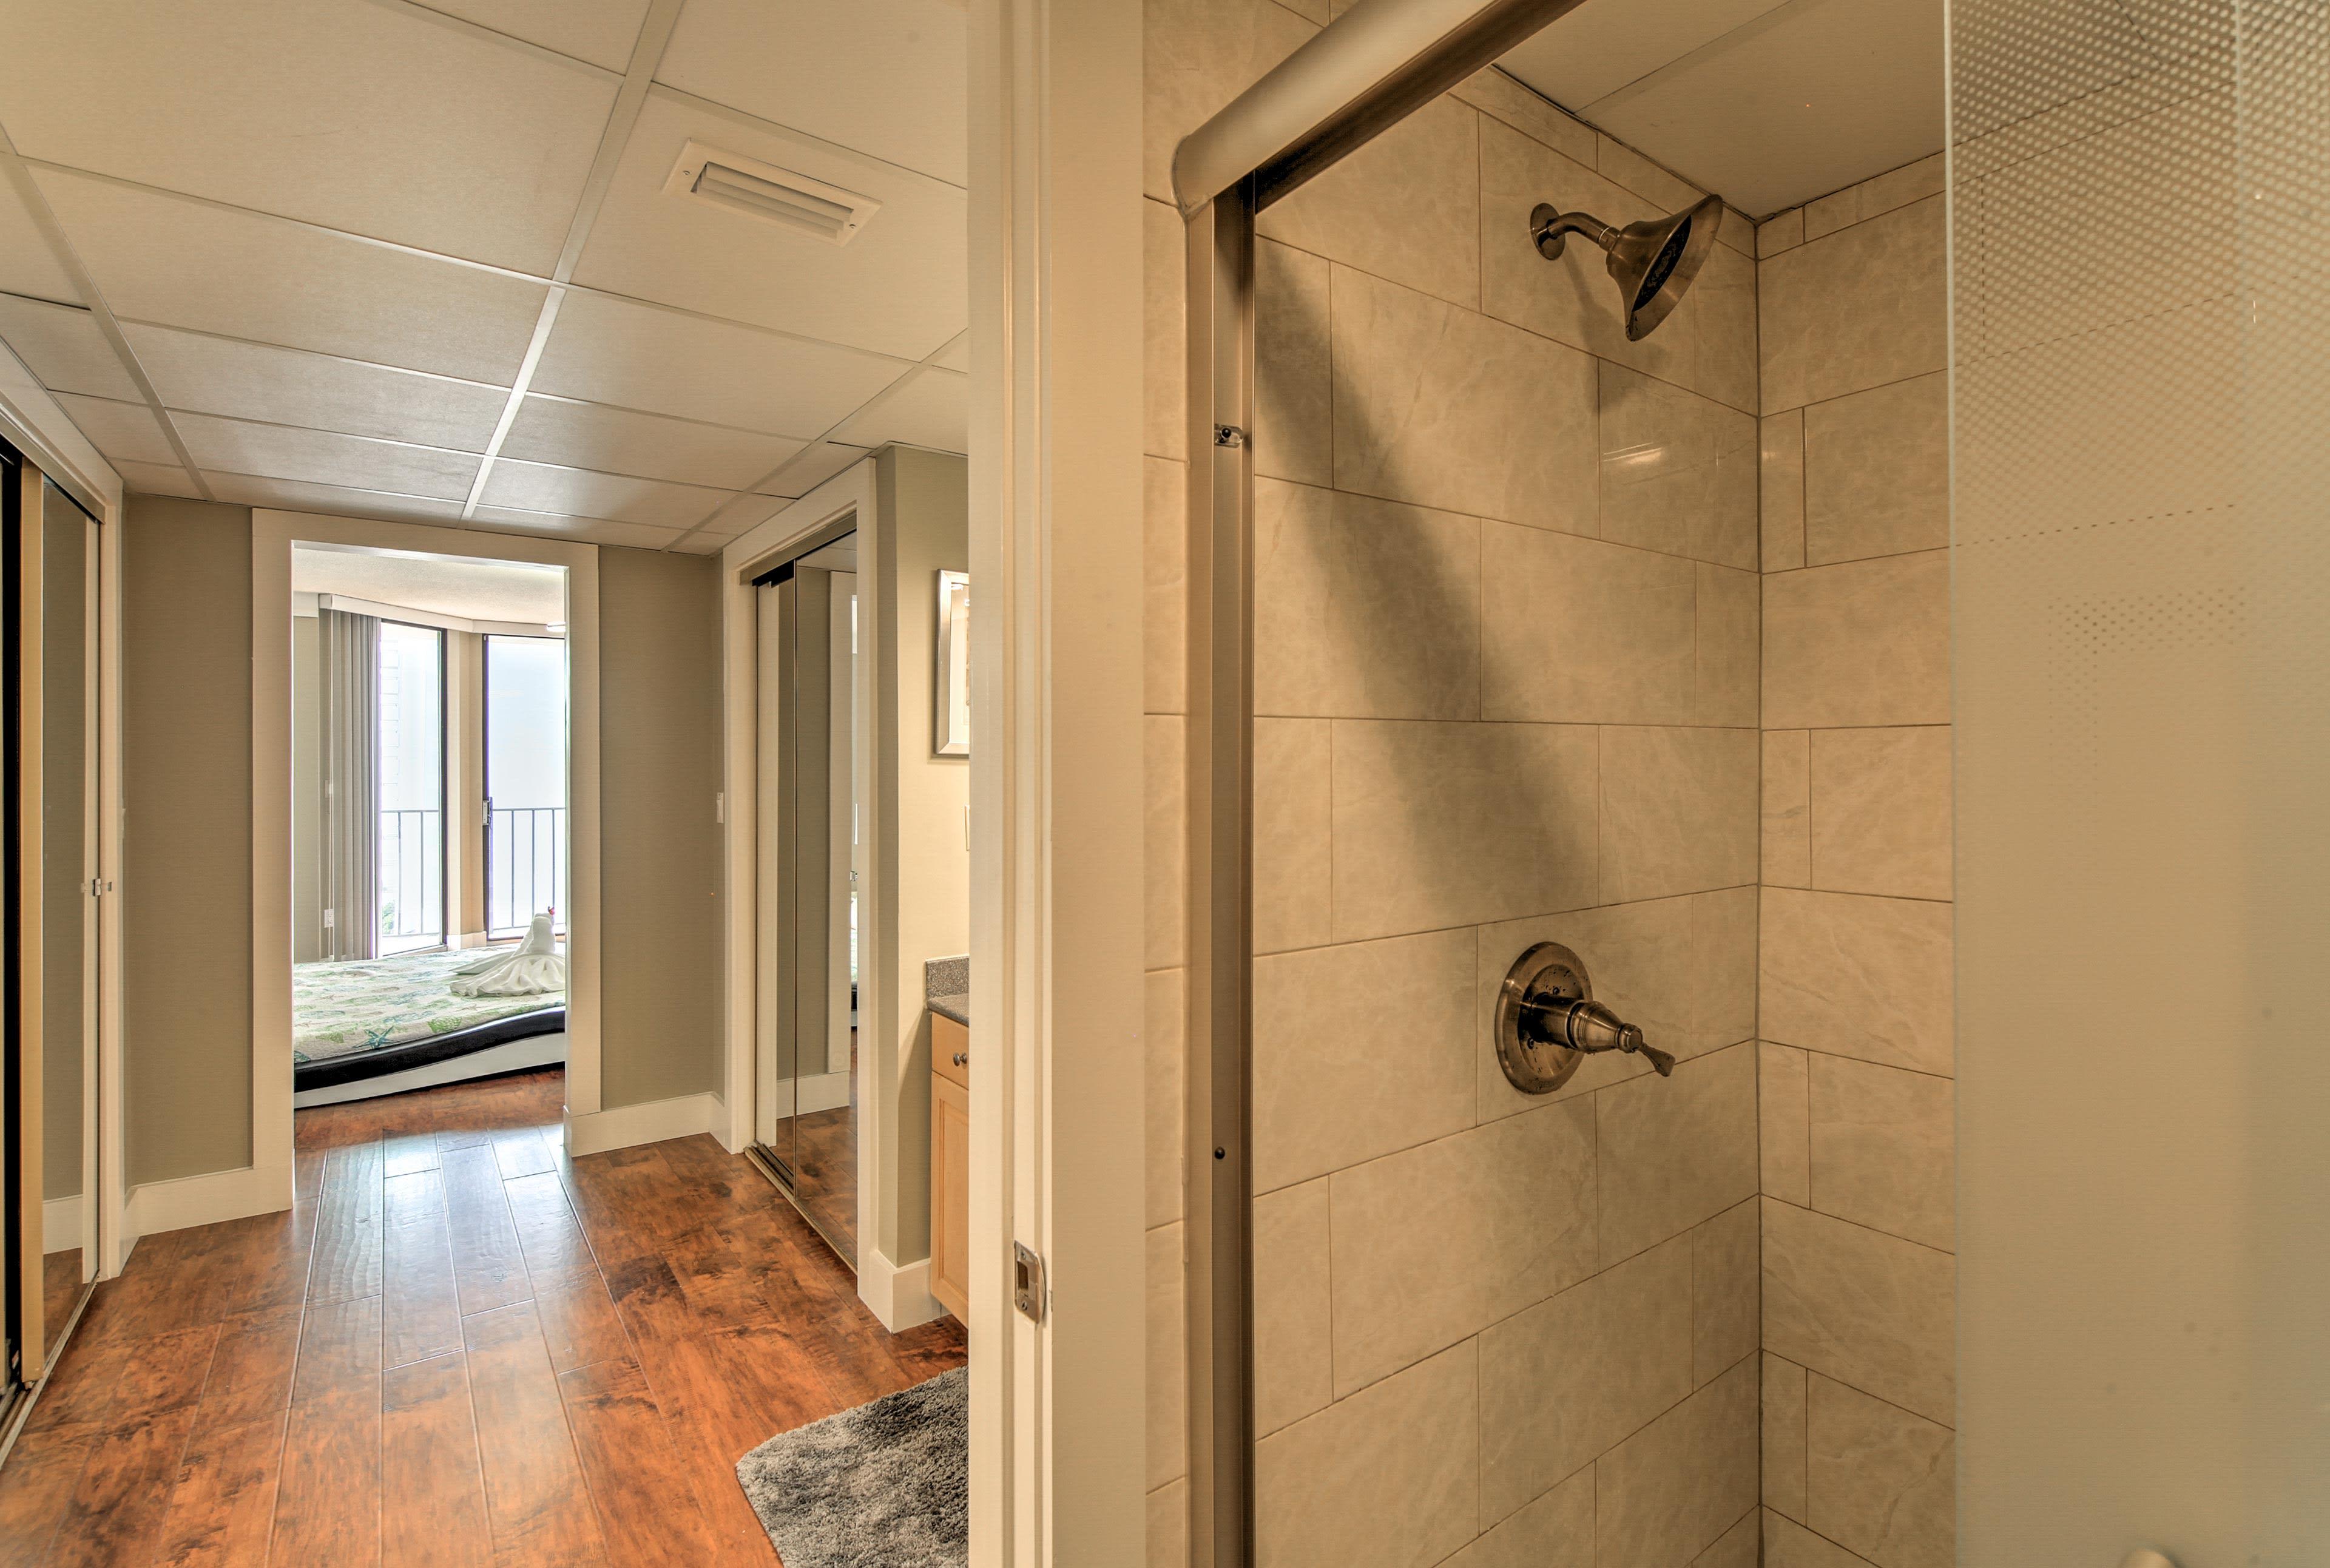 Each room also has access to an en-suite bathroom.